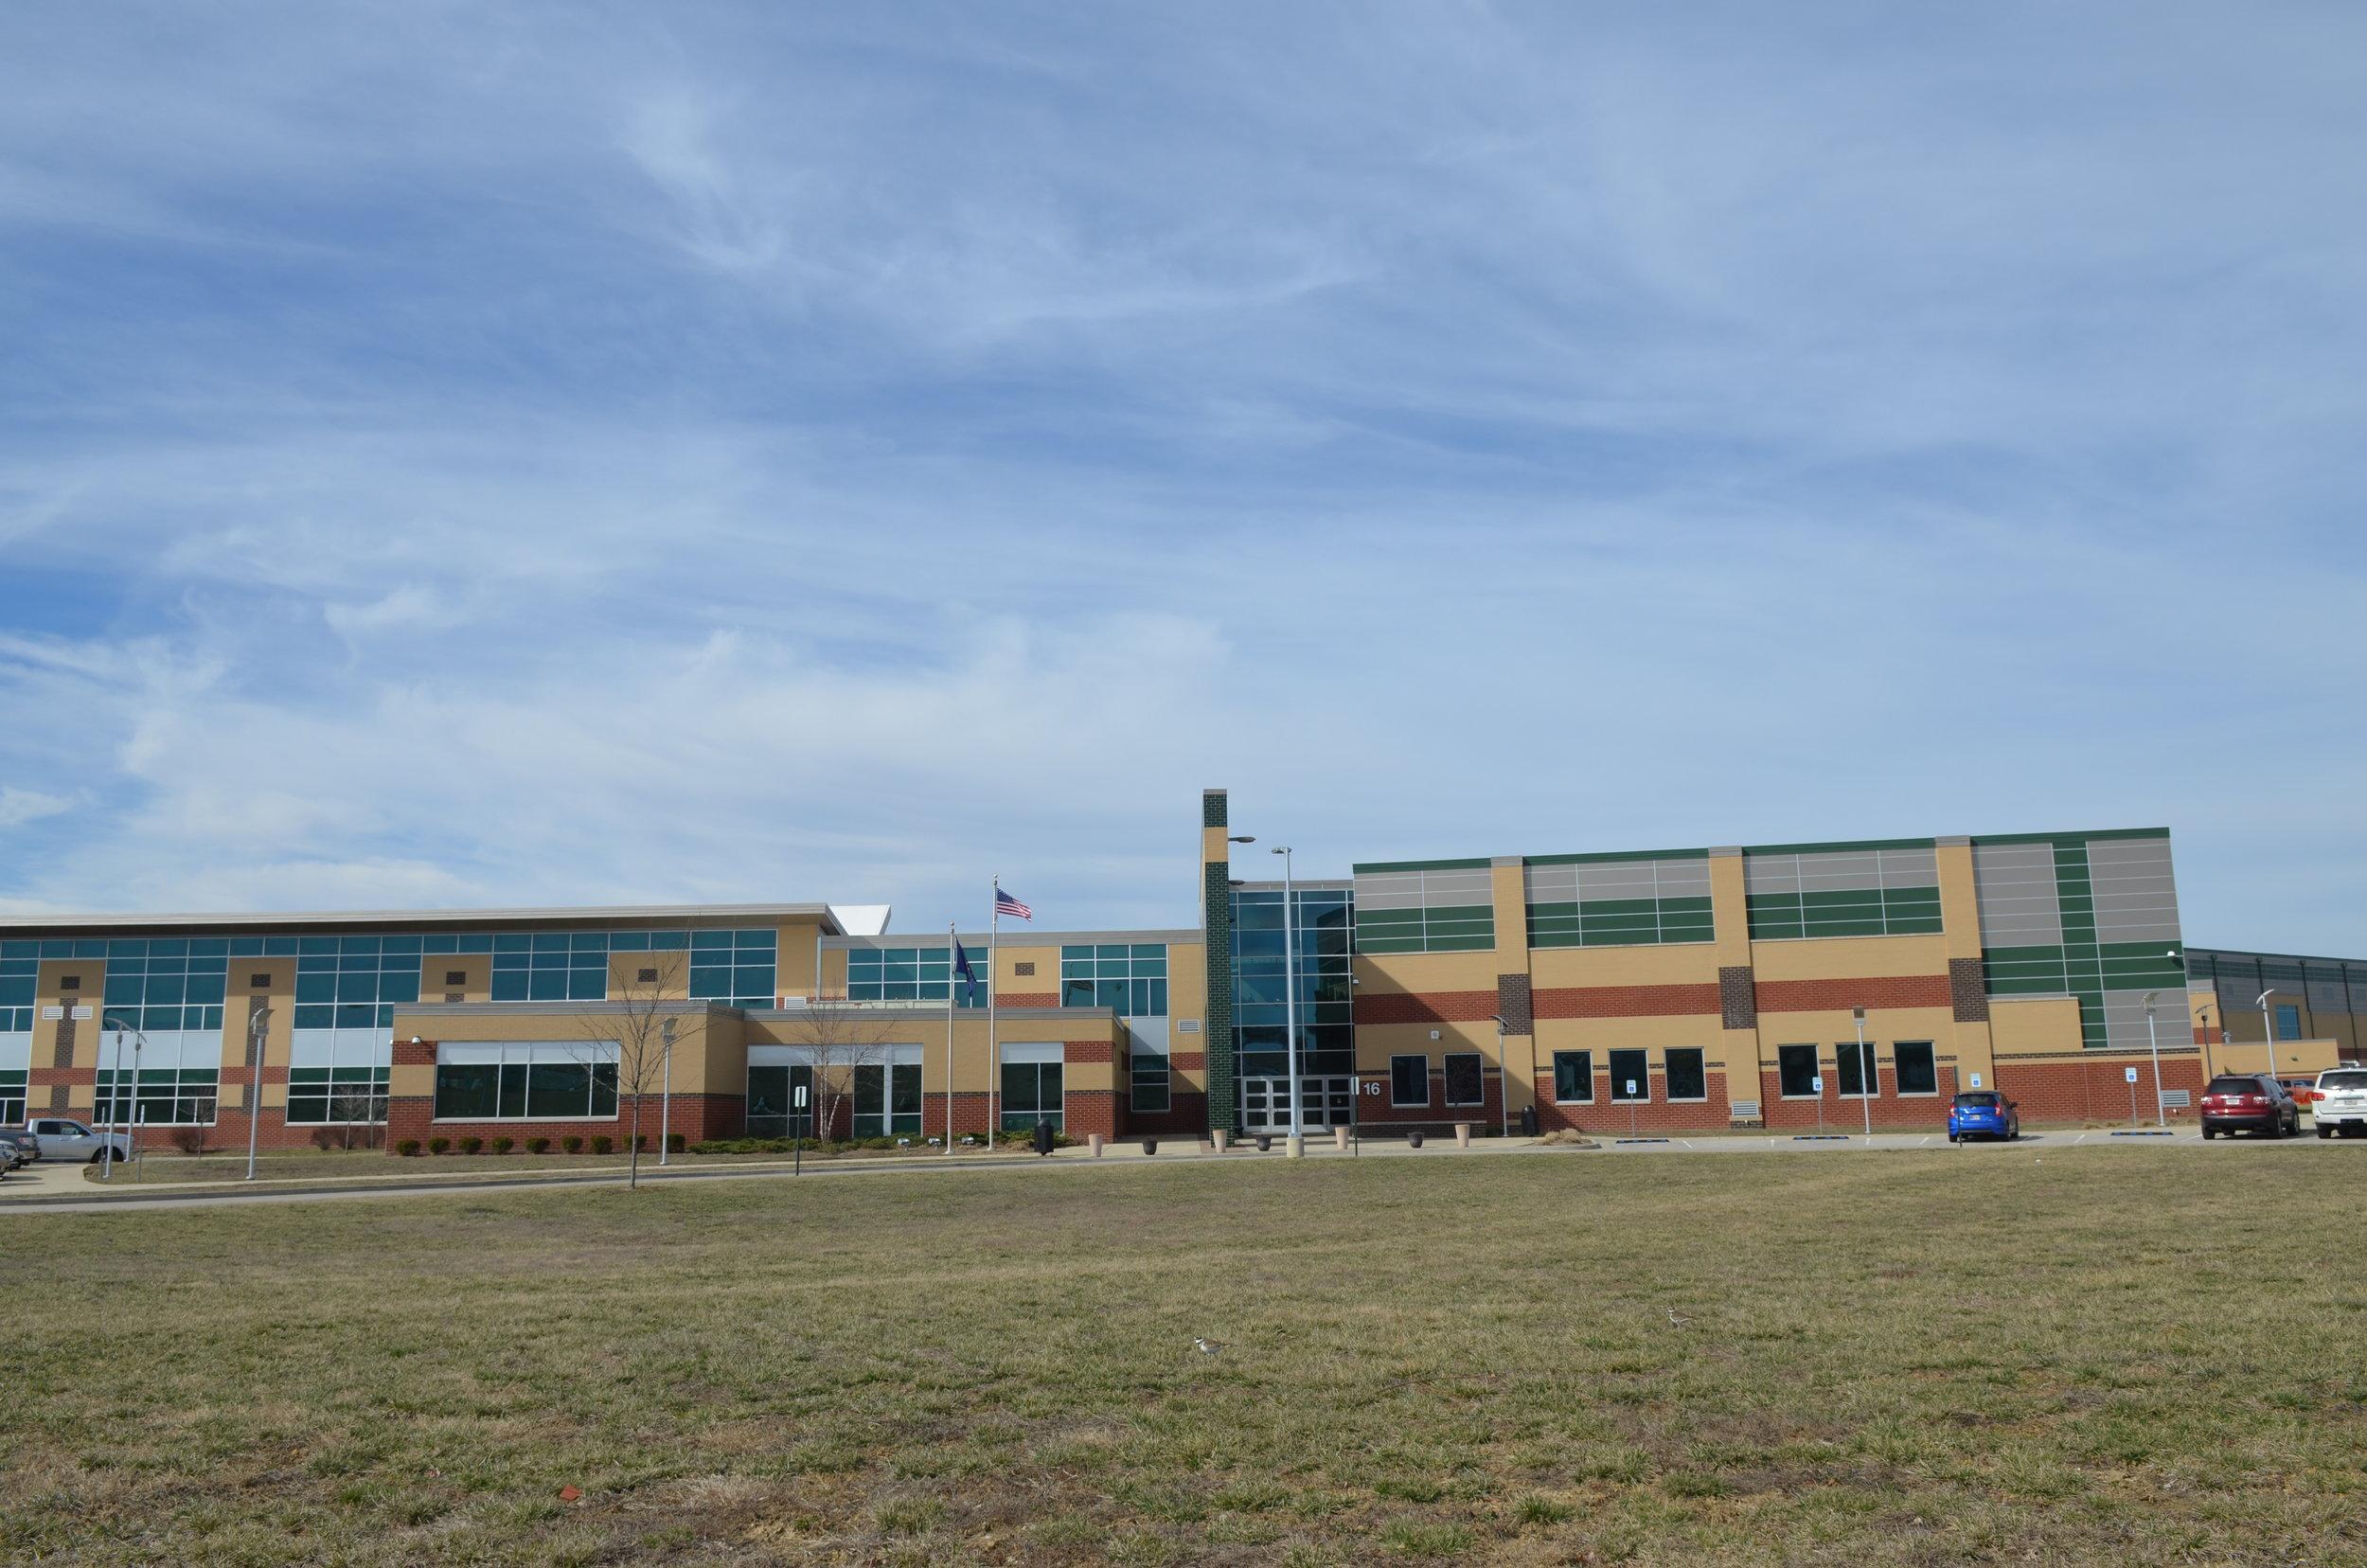 North Jr Sr High School